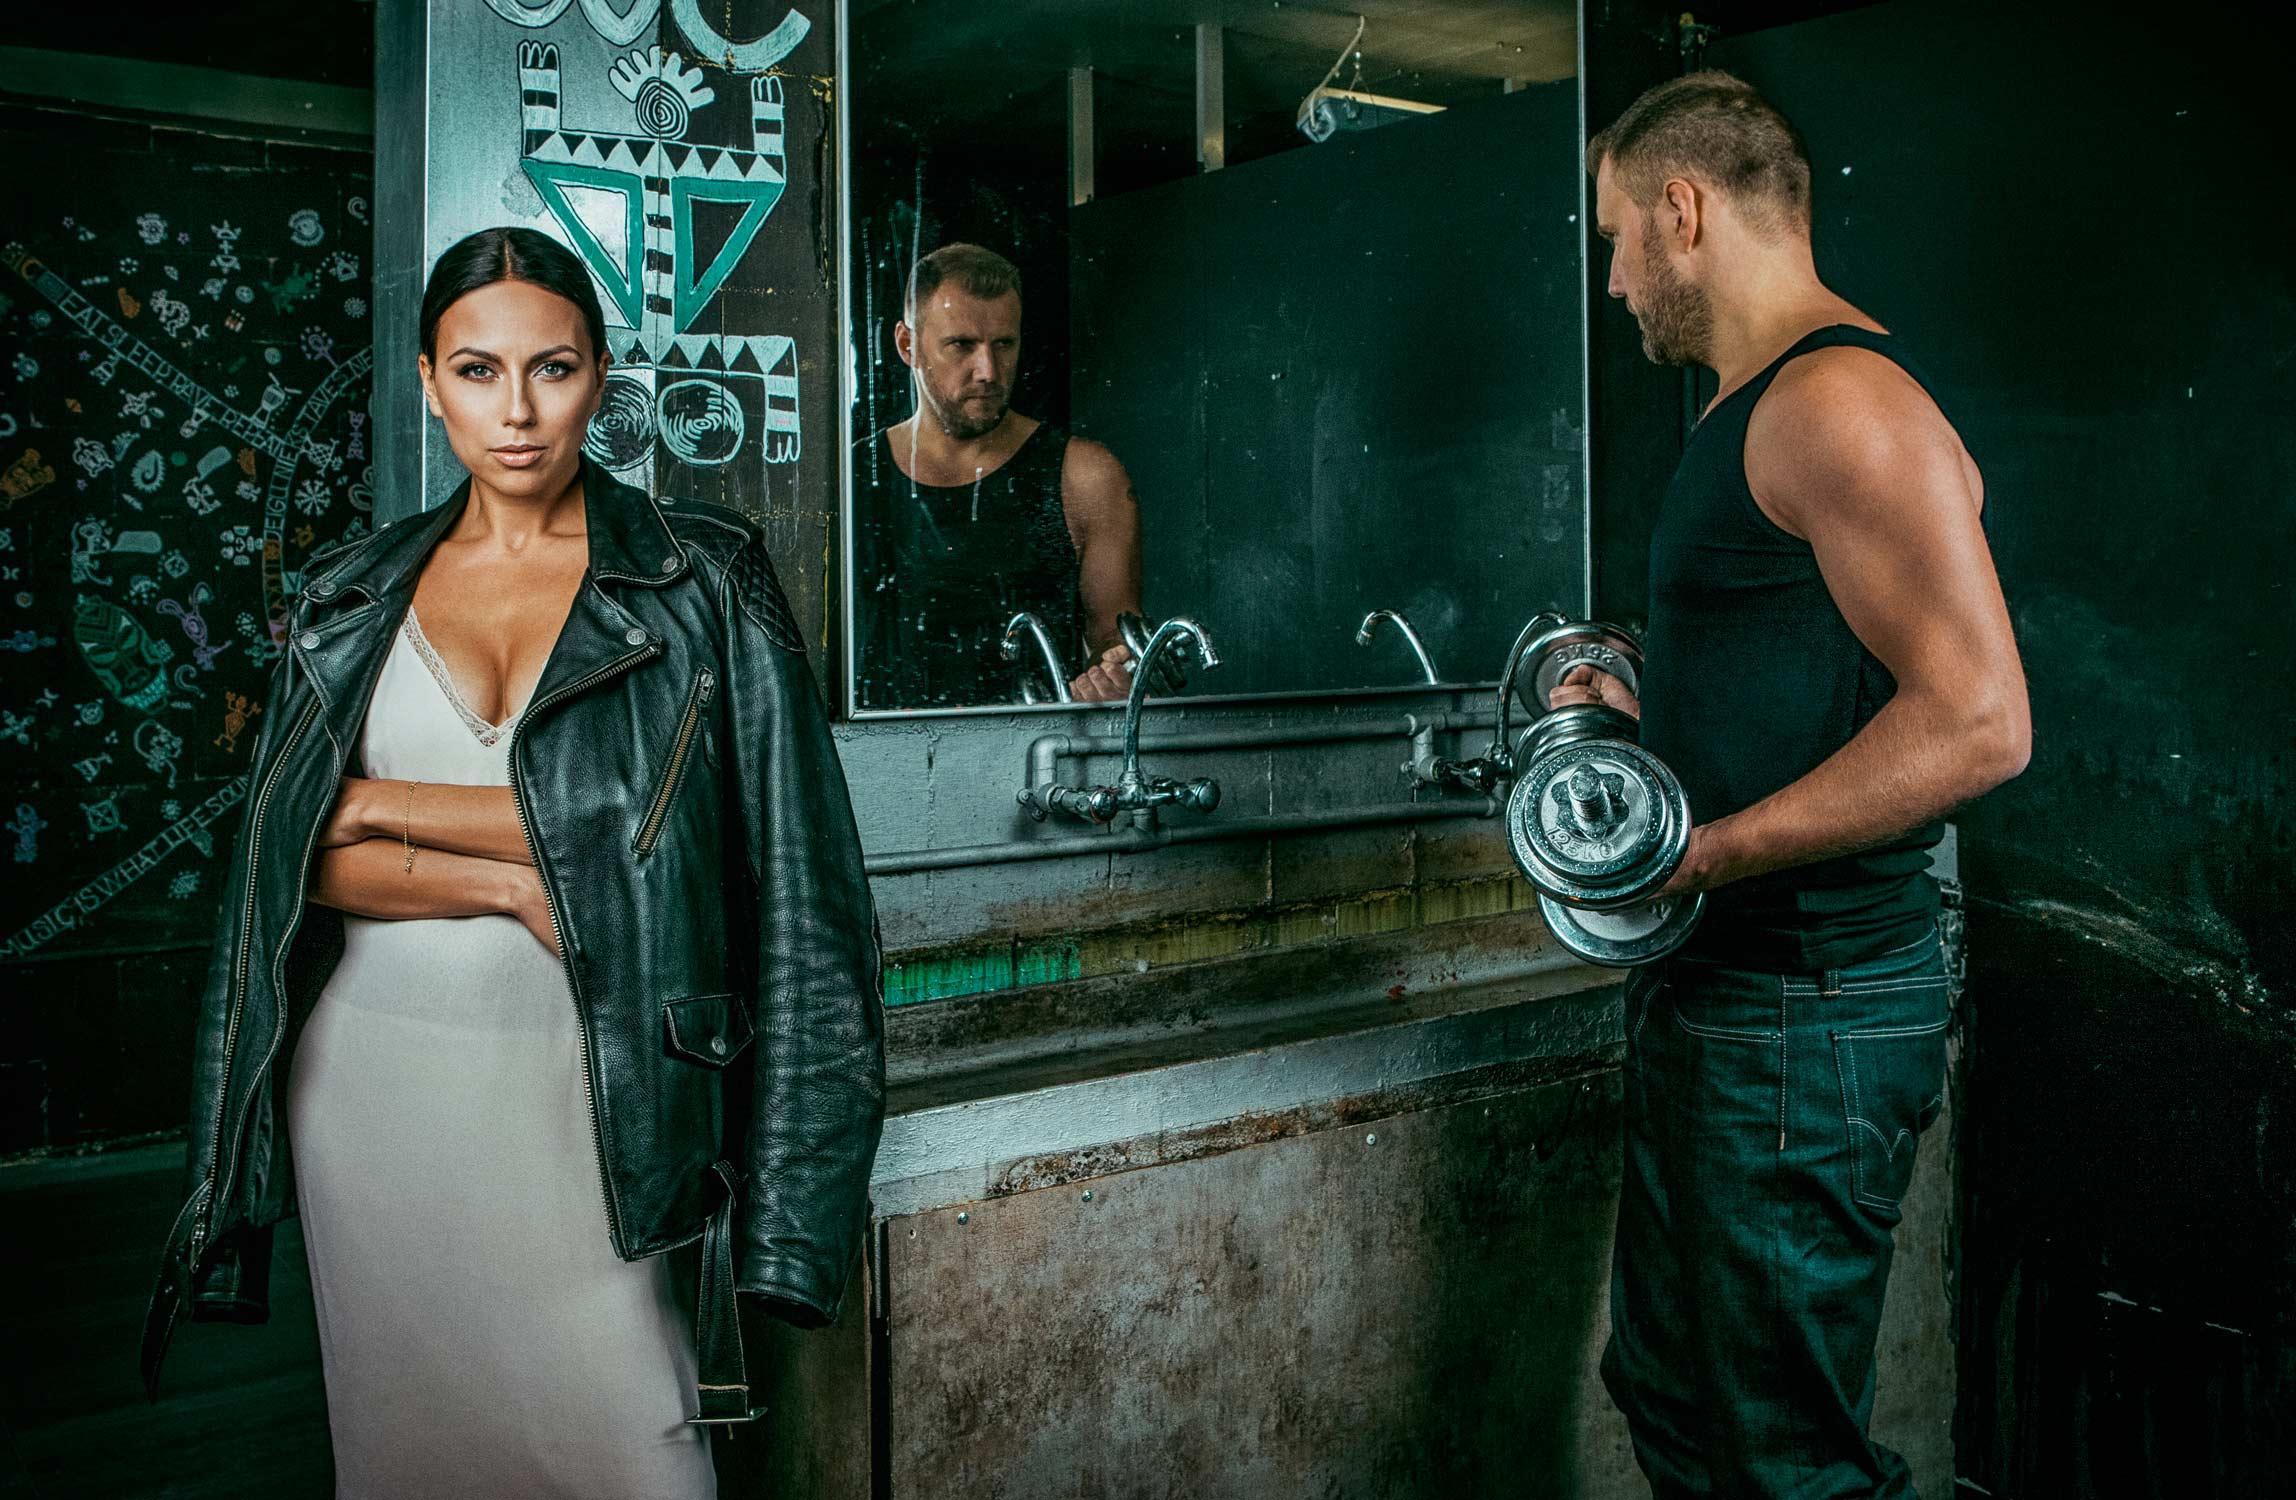 <p>Julija Žižė<br /> Designer<br /> Laurynas Žižys<br /> Photographer<br /> Žmonės magazine<br /> 2016<br /> Lithuania </p>